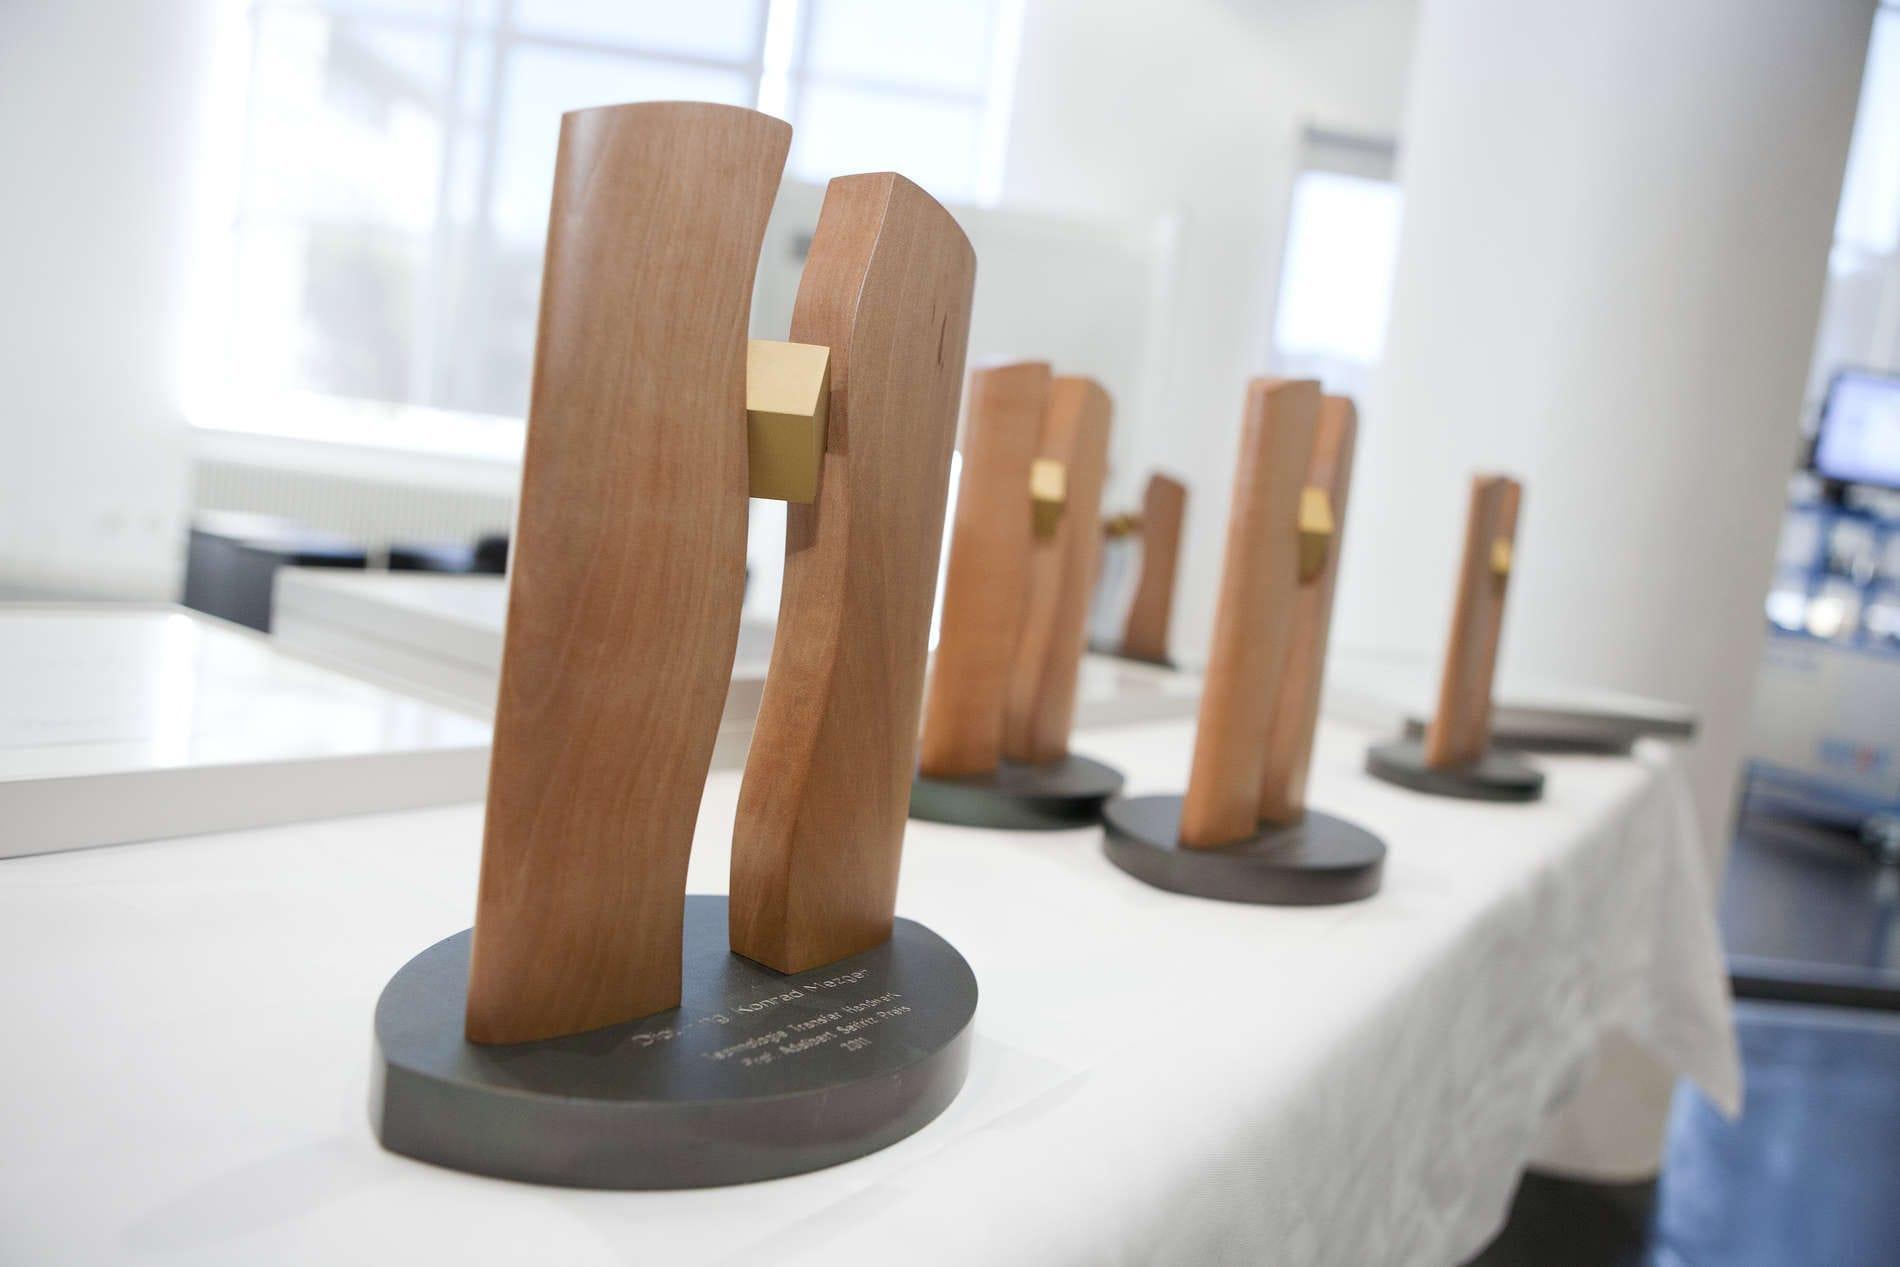 Preisverleihung Seifriz 2011